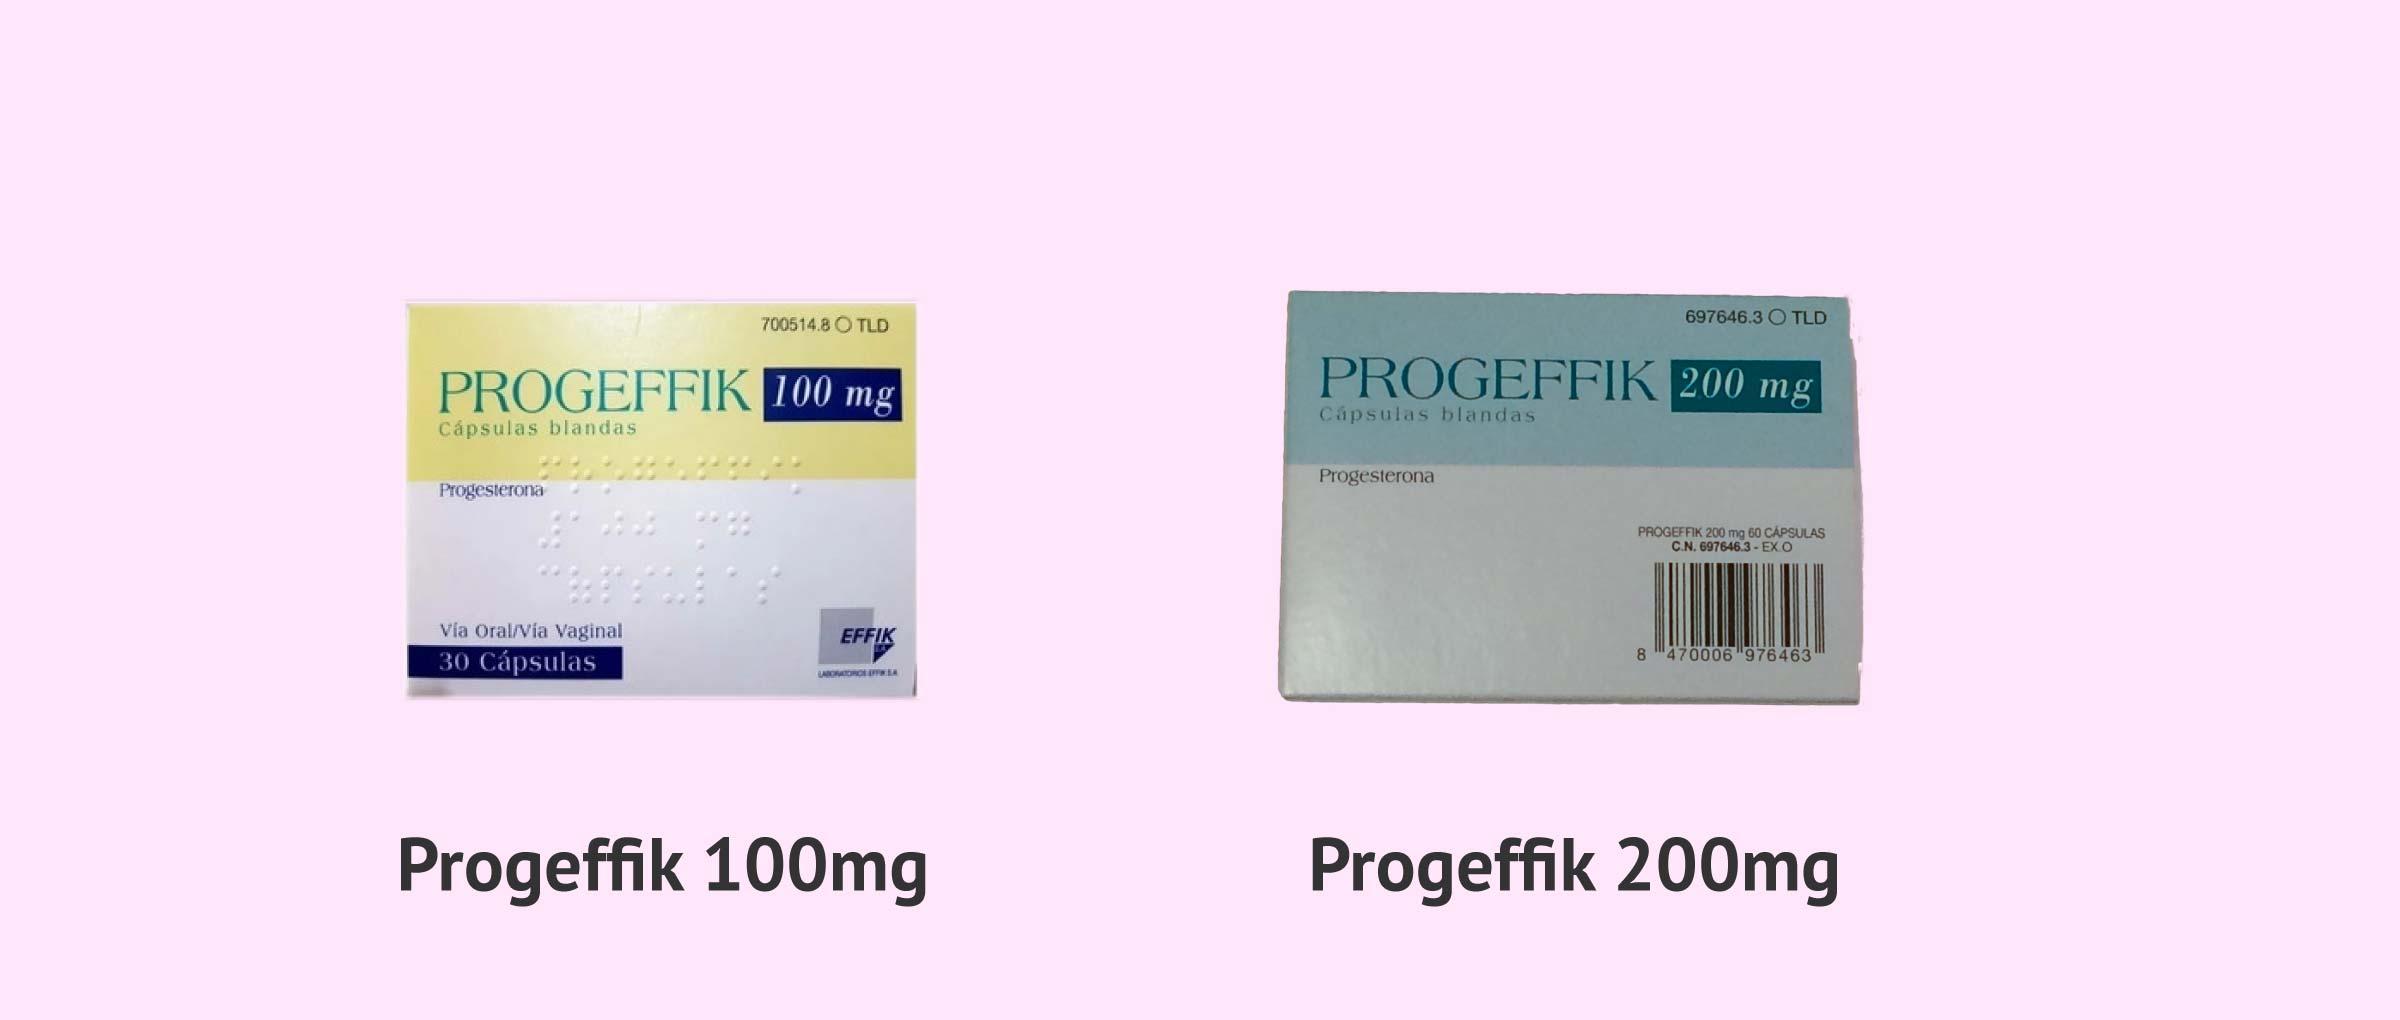 Progeffik 100 mg y Progeffik 200 mg